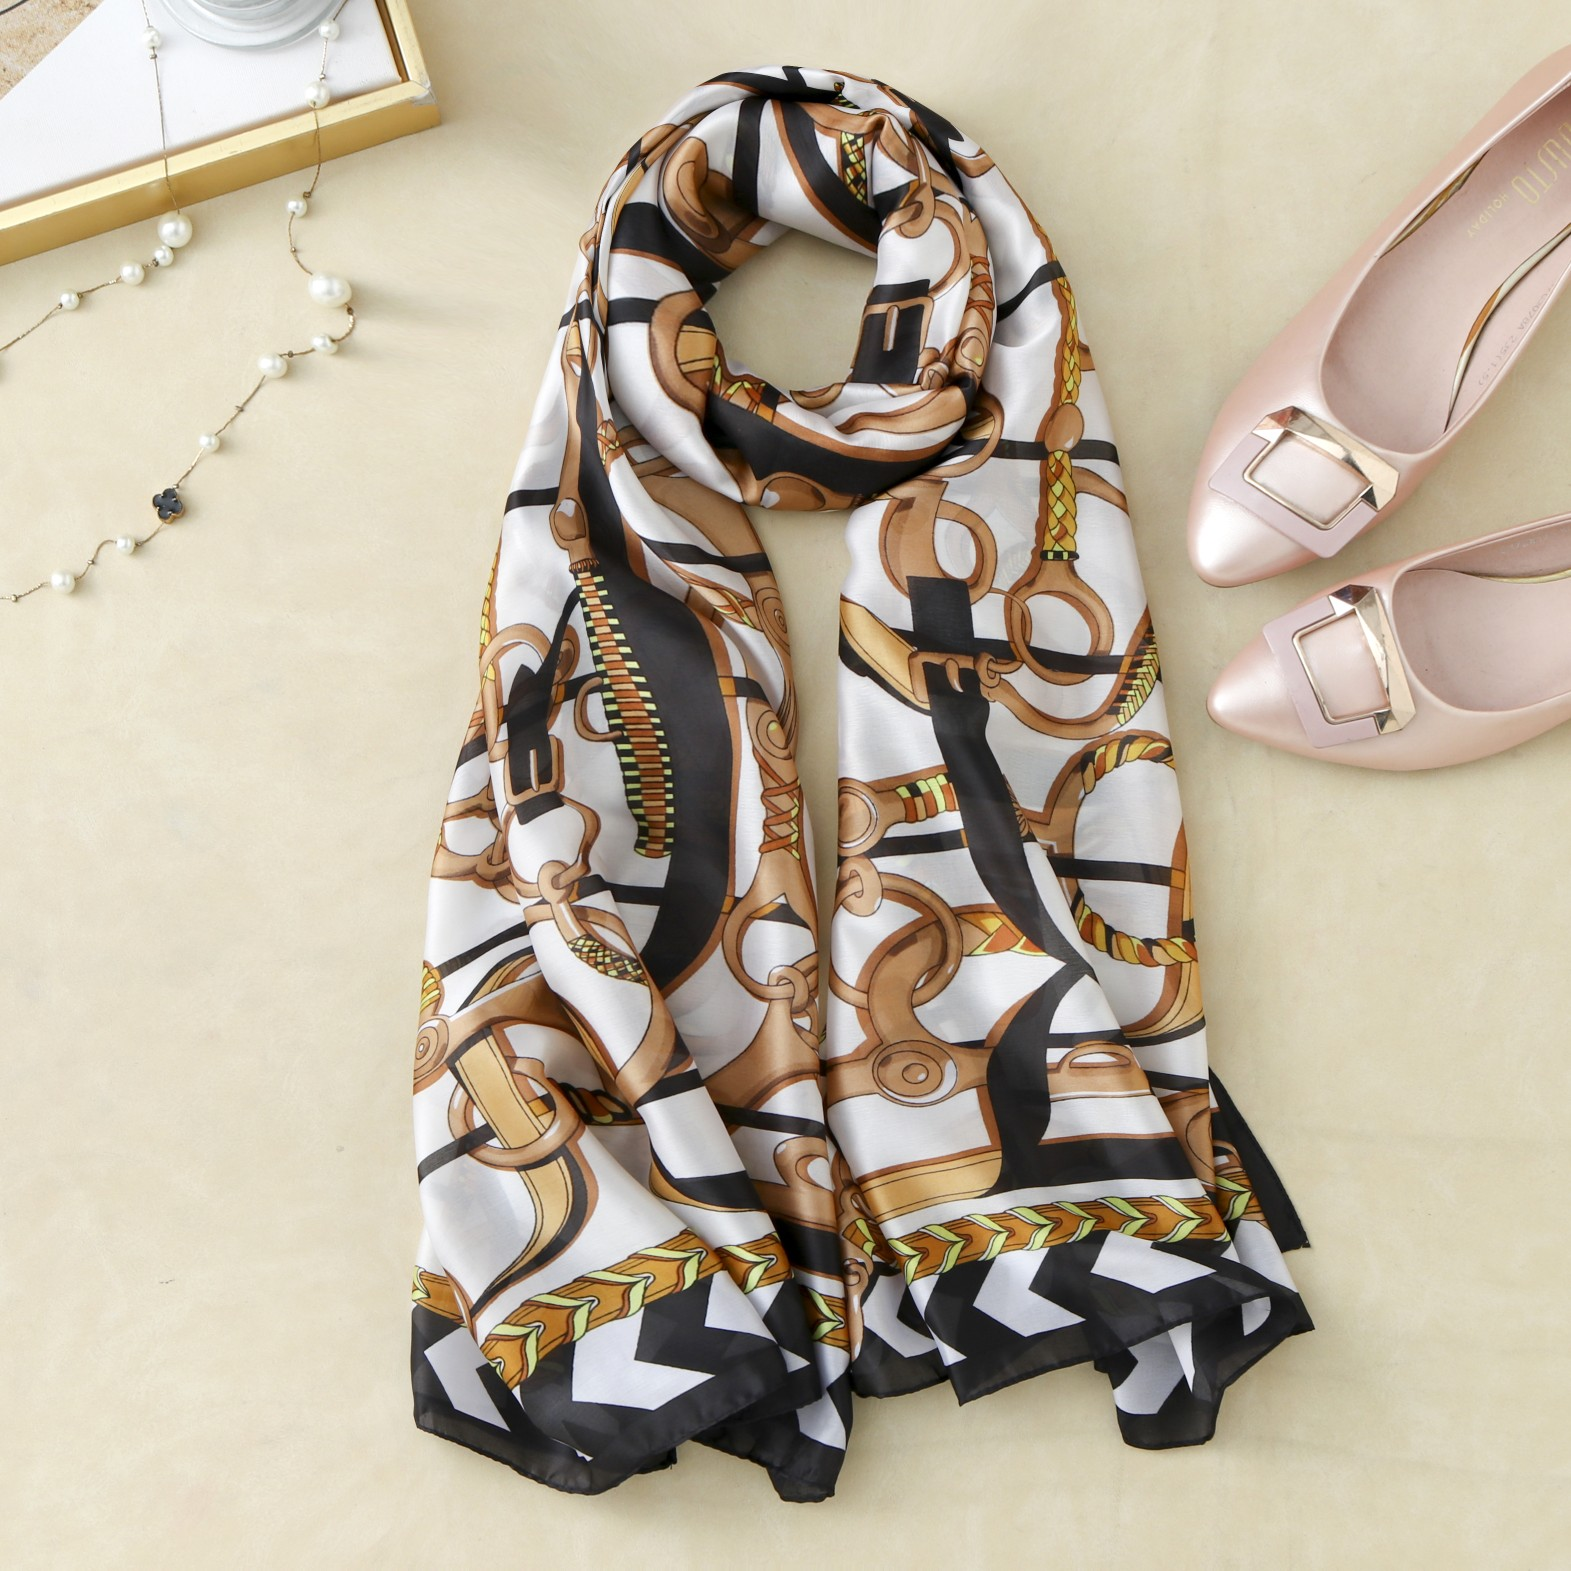 Satin Silk Feeling Scarf Women Head Scarfs Bundle Foulard Soie Female Shawl Ladies Colorful Pattern Print Scarves